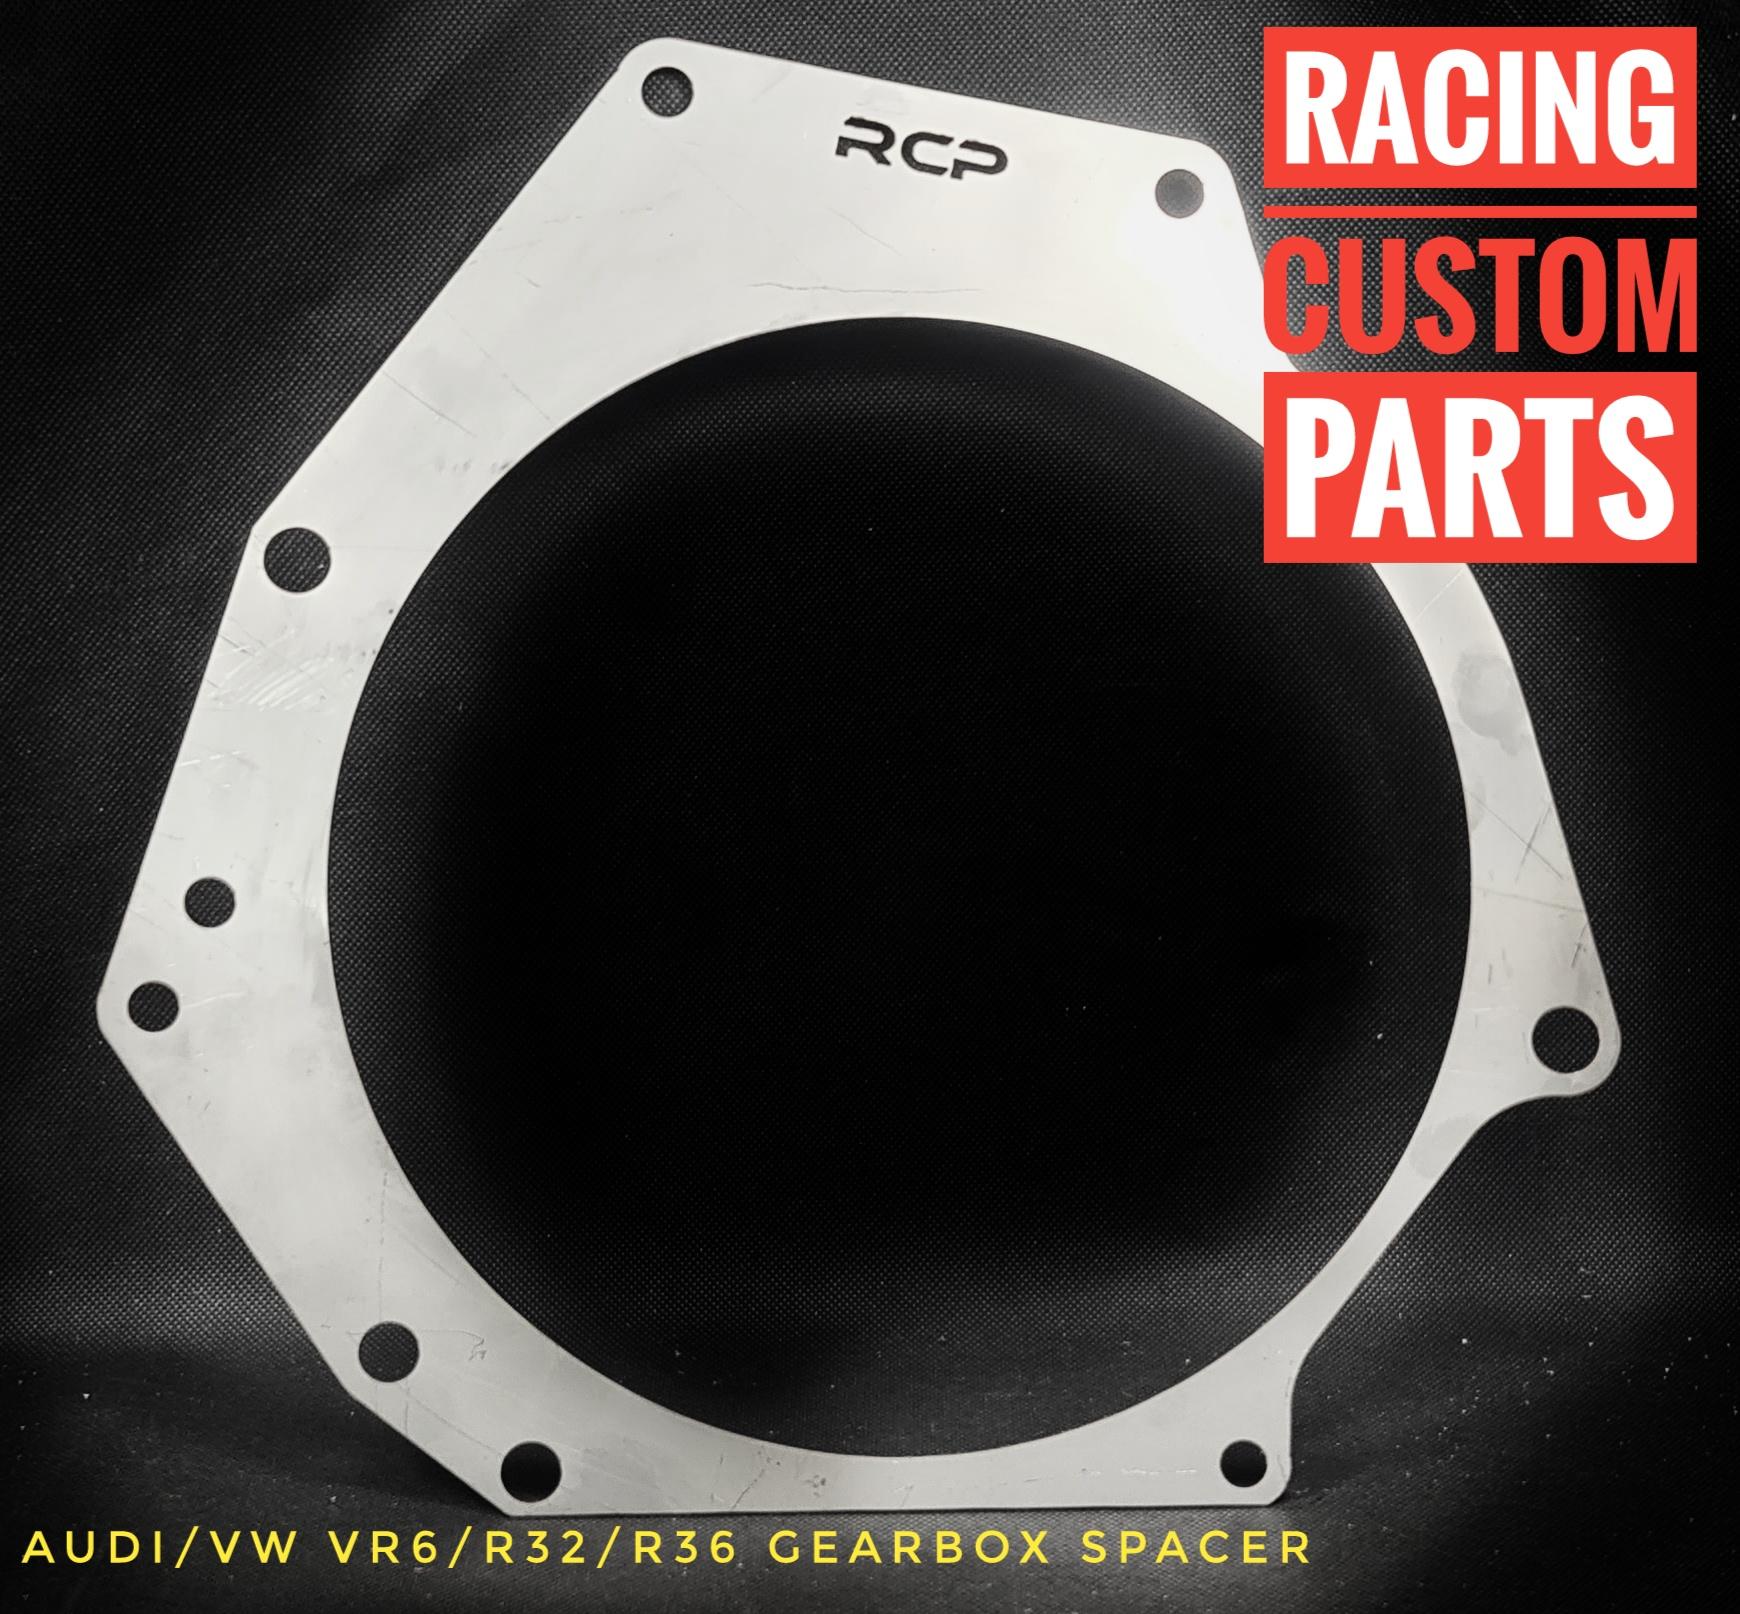 audi vw vr6 r32 r36 gearbox spacer clutch racing custom parts billet cnc